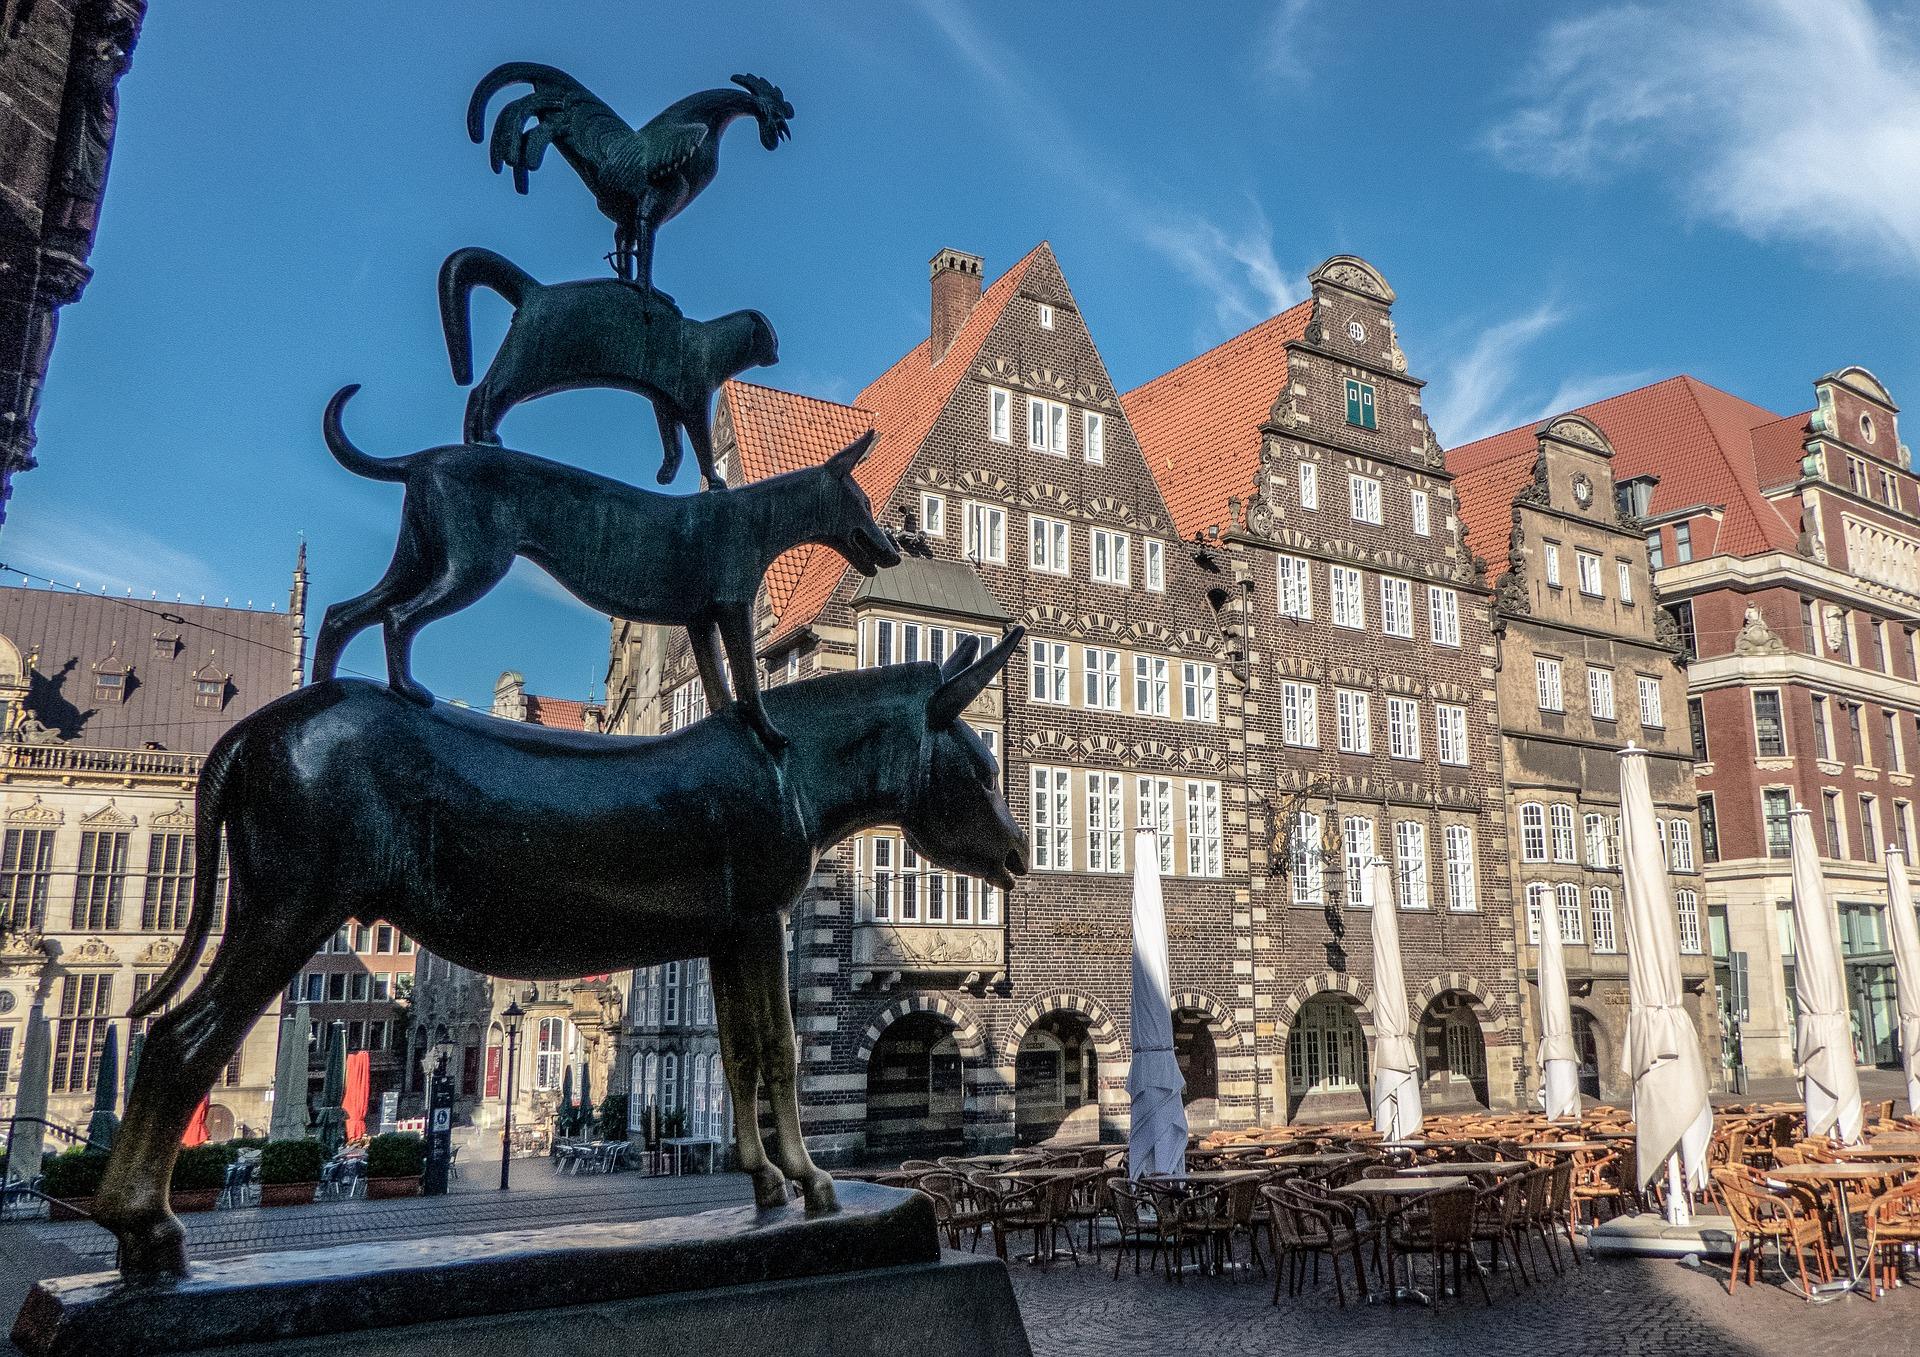 Німеччина Бремен пам'ятник музикантам